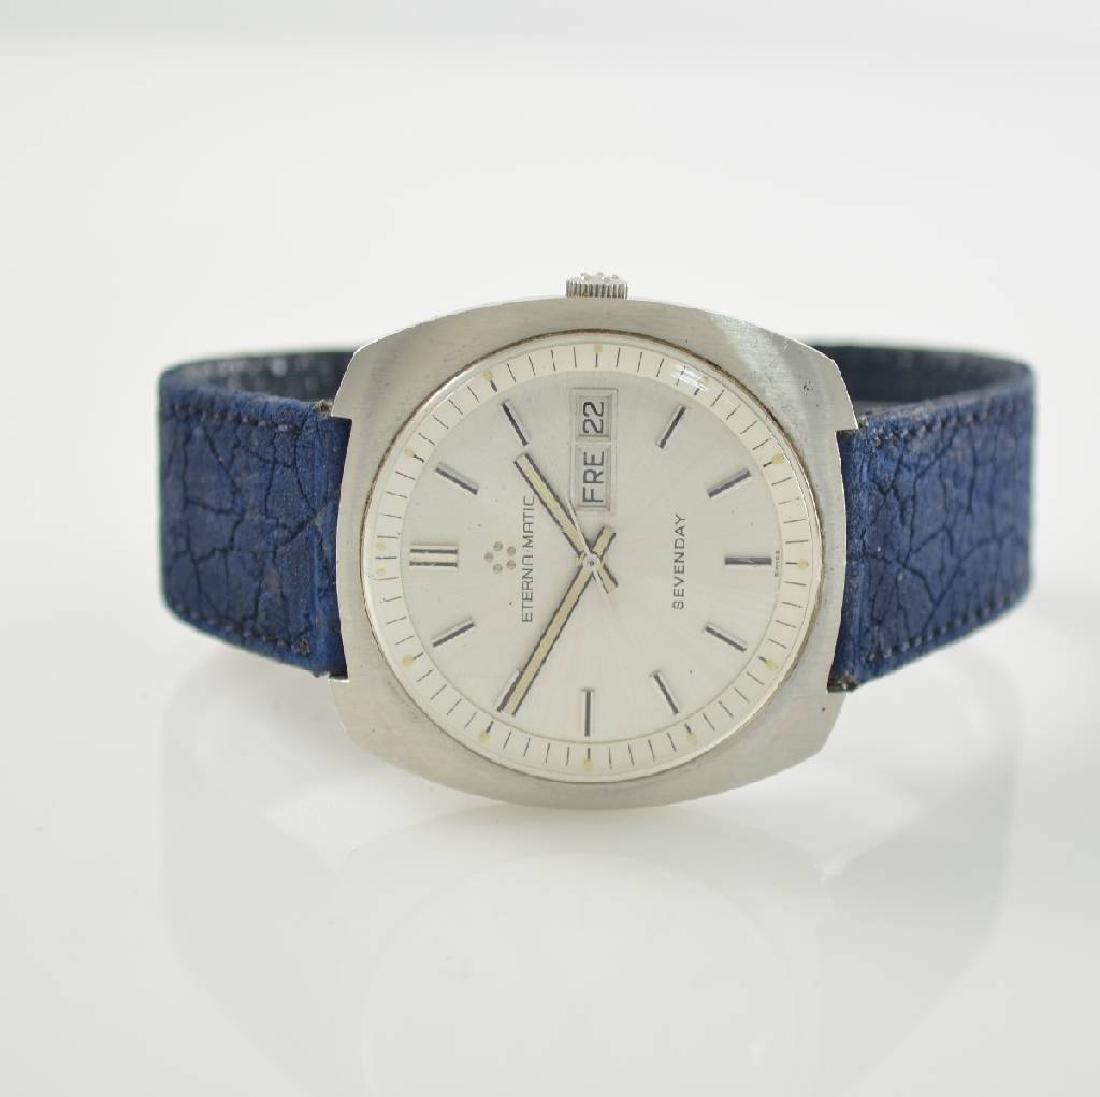 ETERNA-MATIC Sevenday gents wristwatch